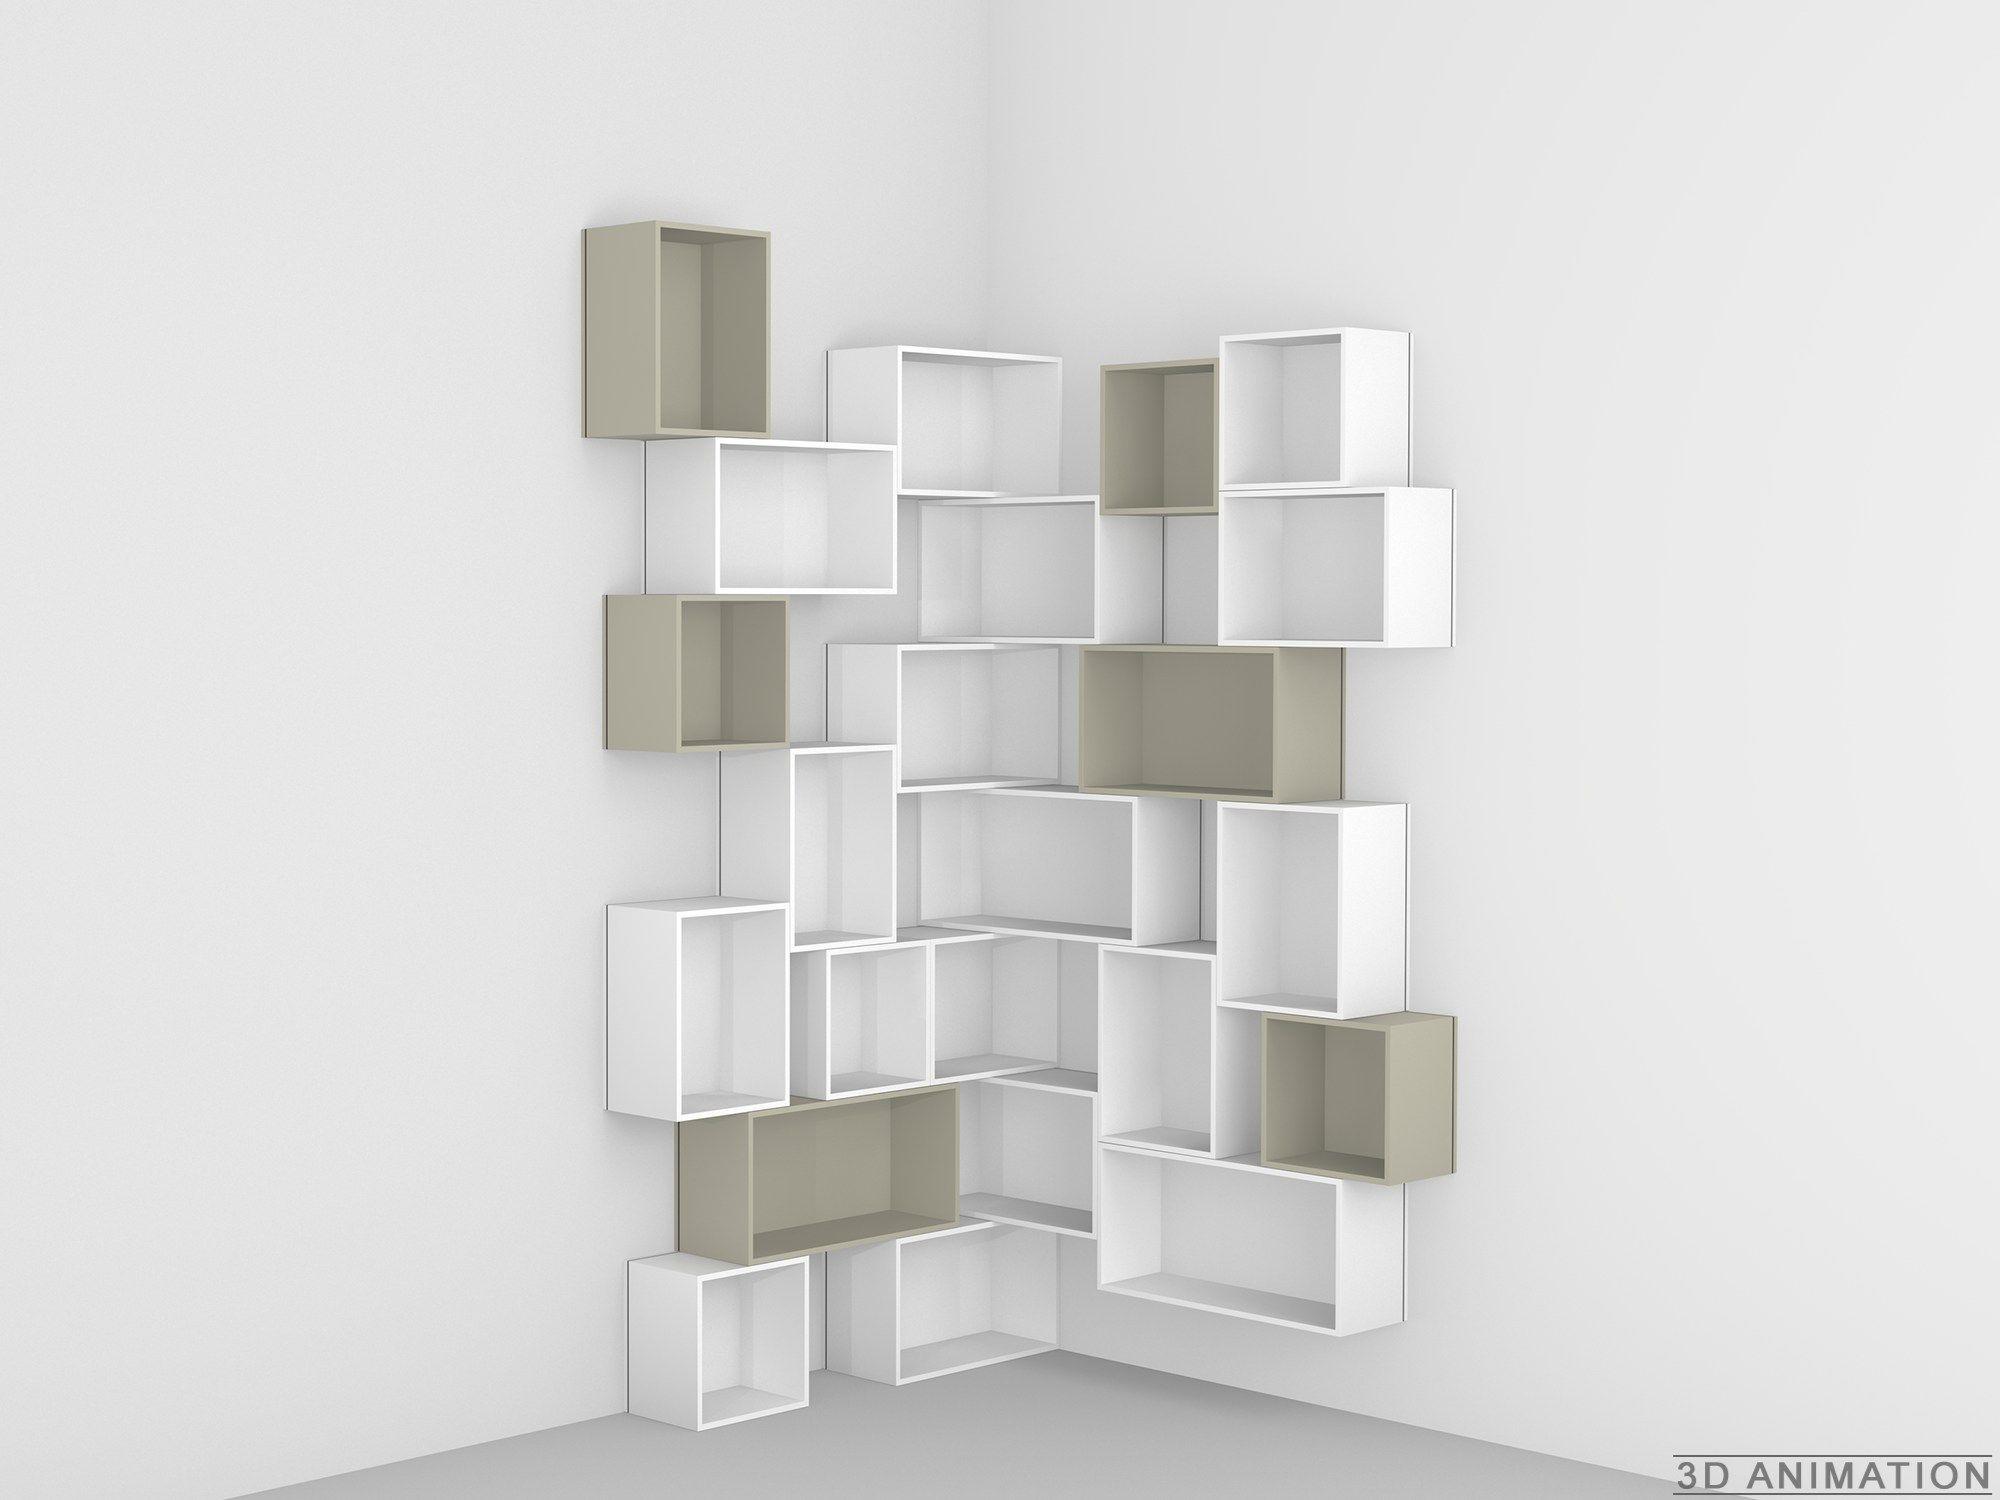 Modulares Bucherregal By Cubit By Mymito Design Cubit Regal Regal Design Eckregal Wohnzimmer